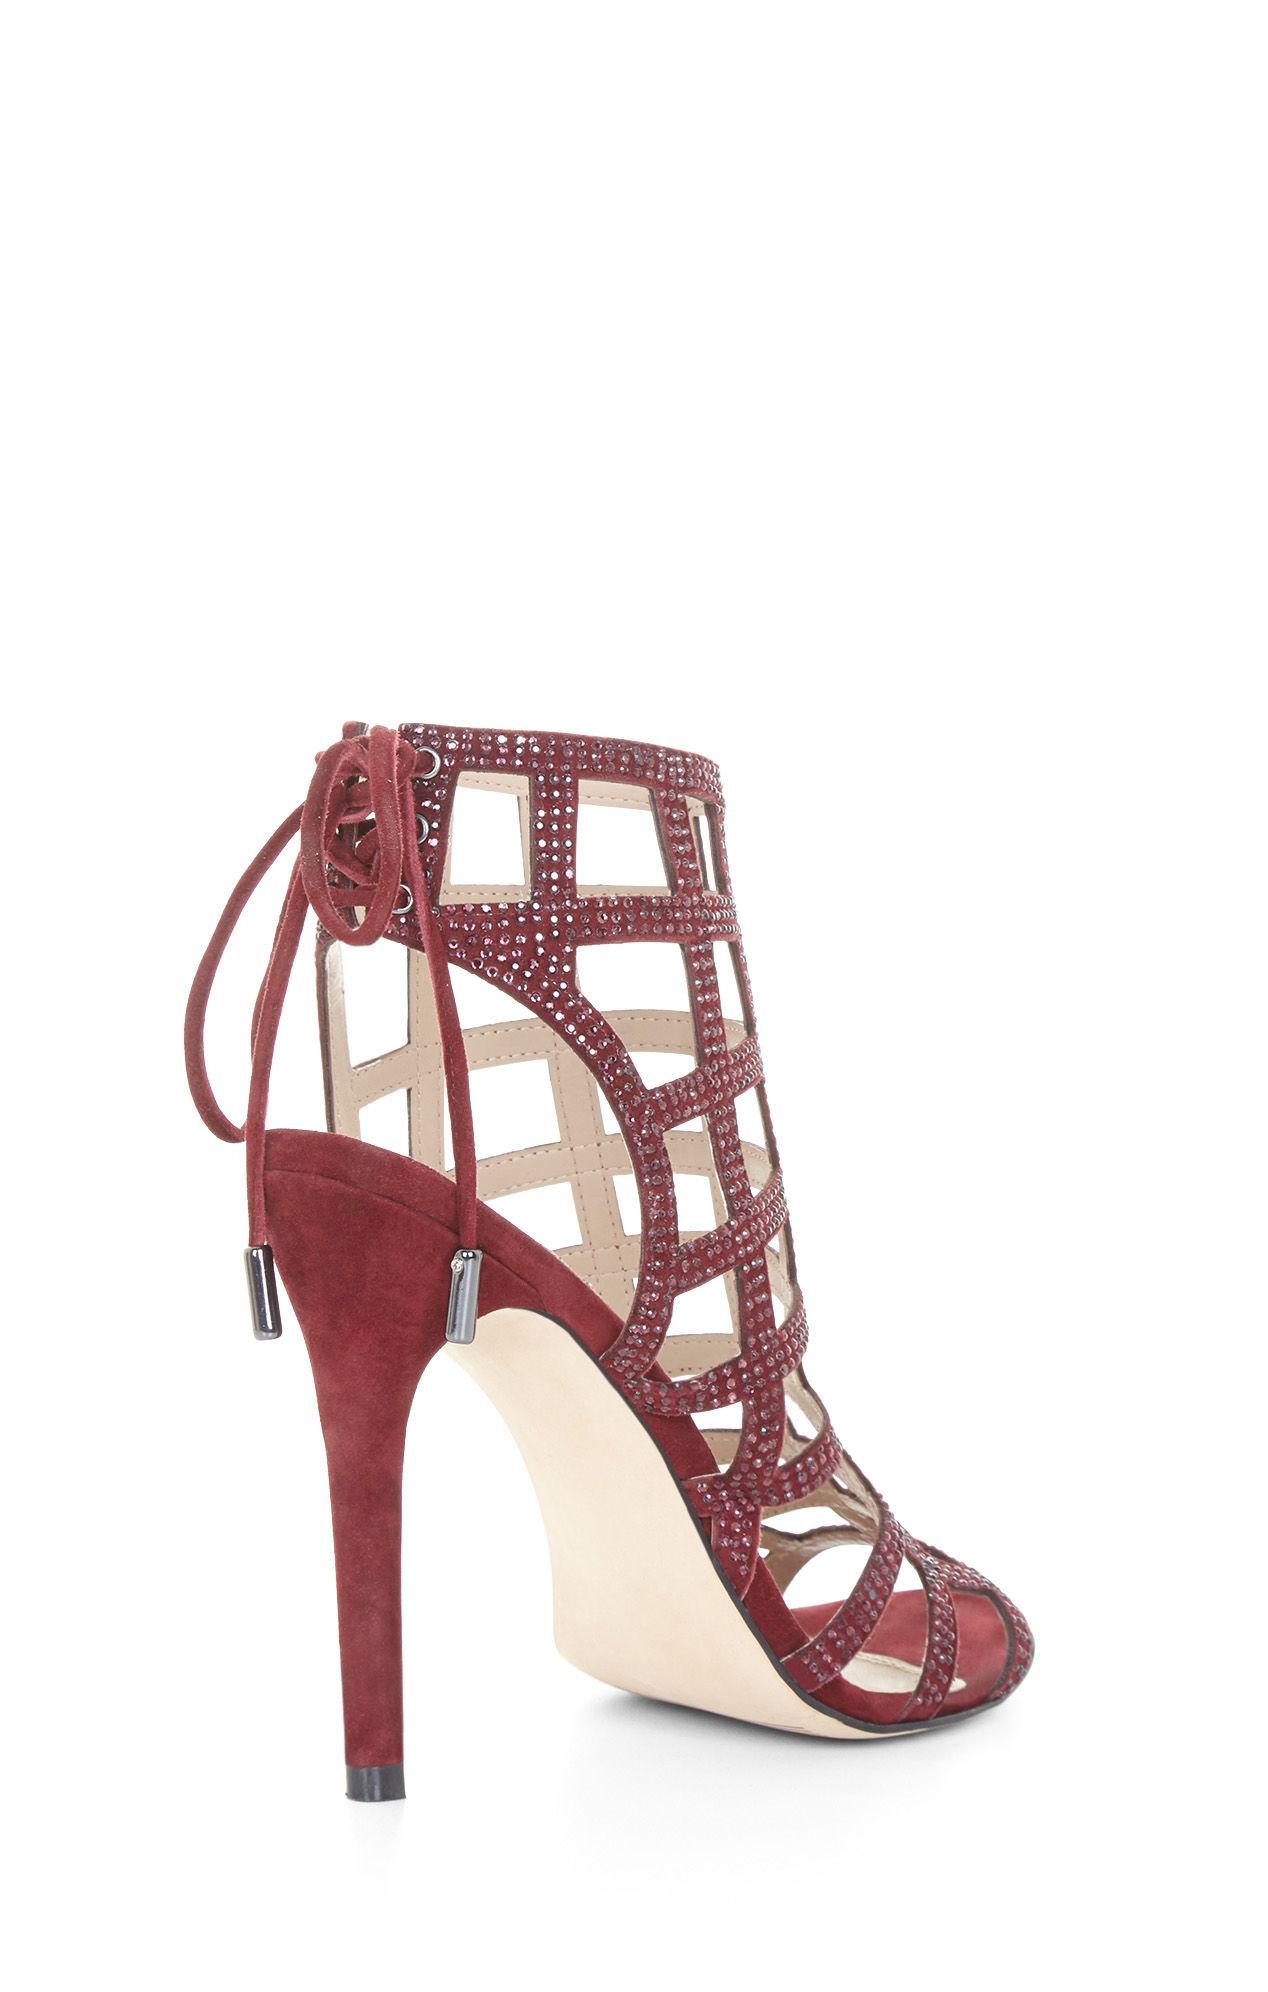 4f964d29cebb Lyst - BCBGMAXAZRIA Lien High-heel Caged Sandal in Purple